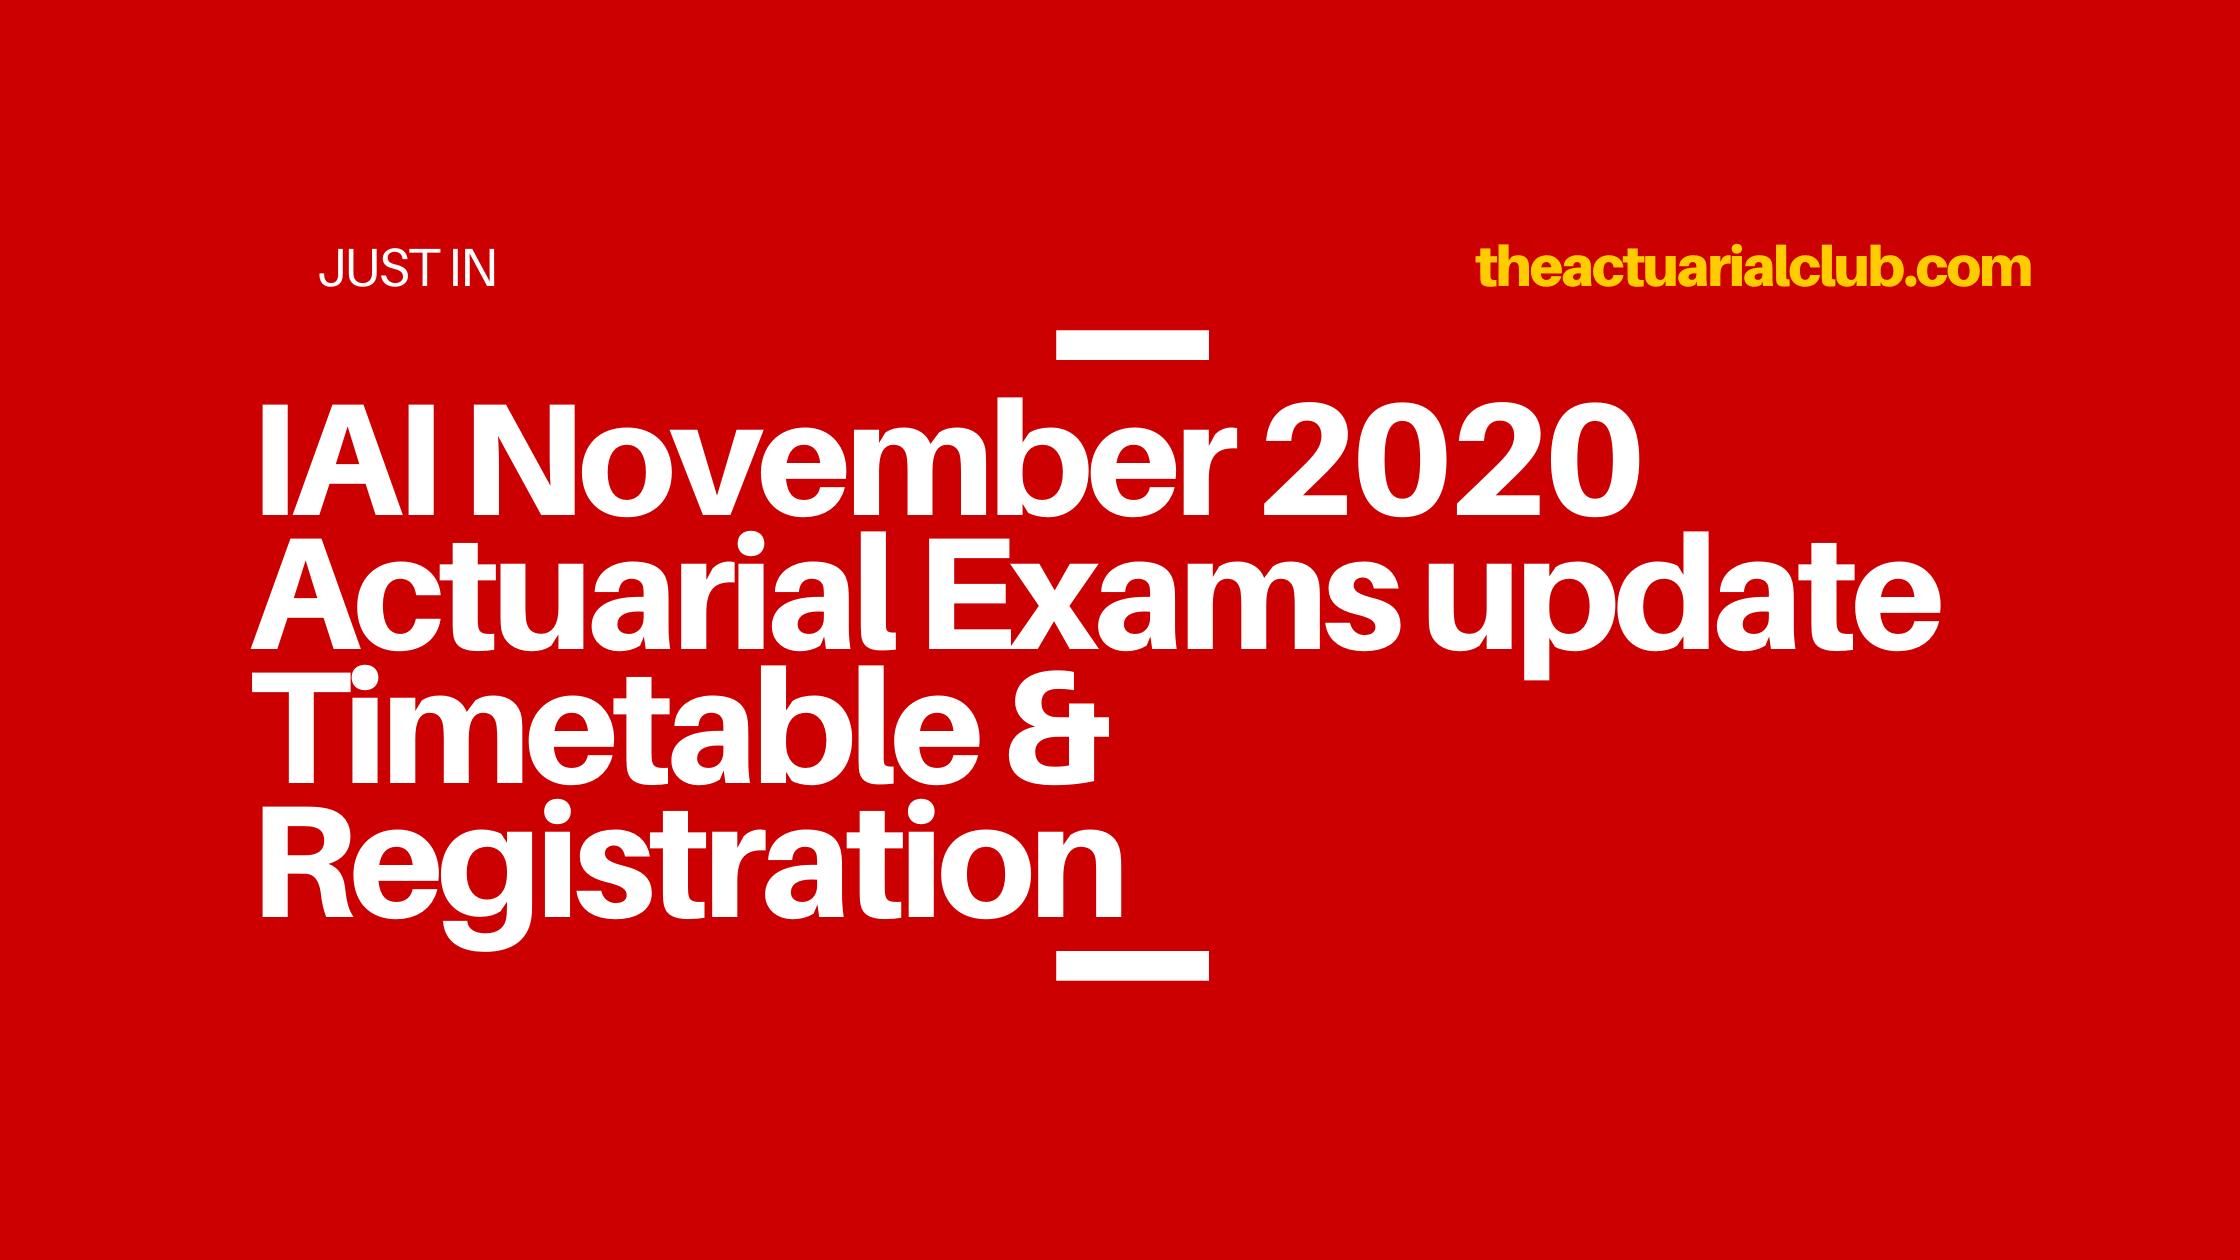 IAI November 2020 Actuarial Exams update Timetable & Registration